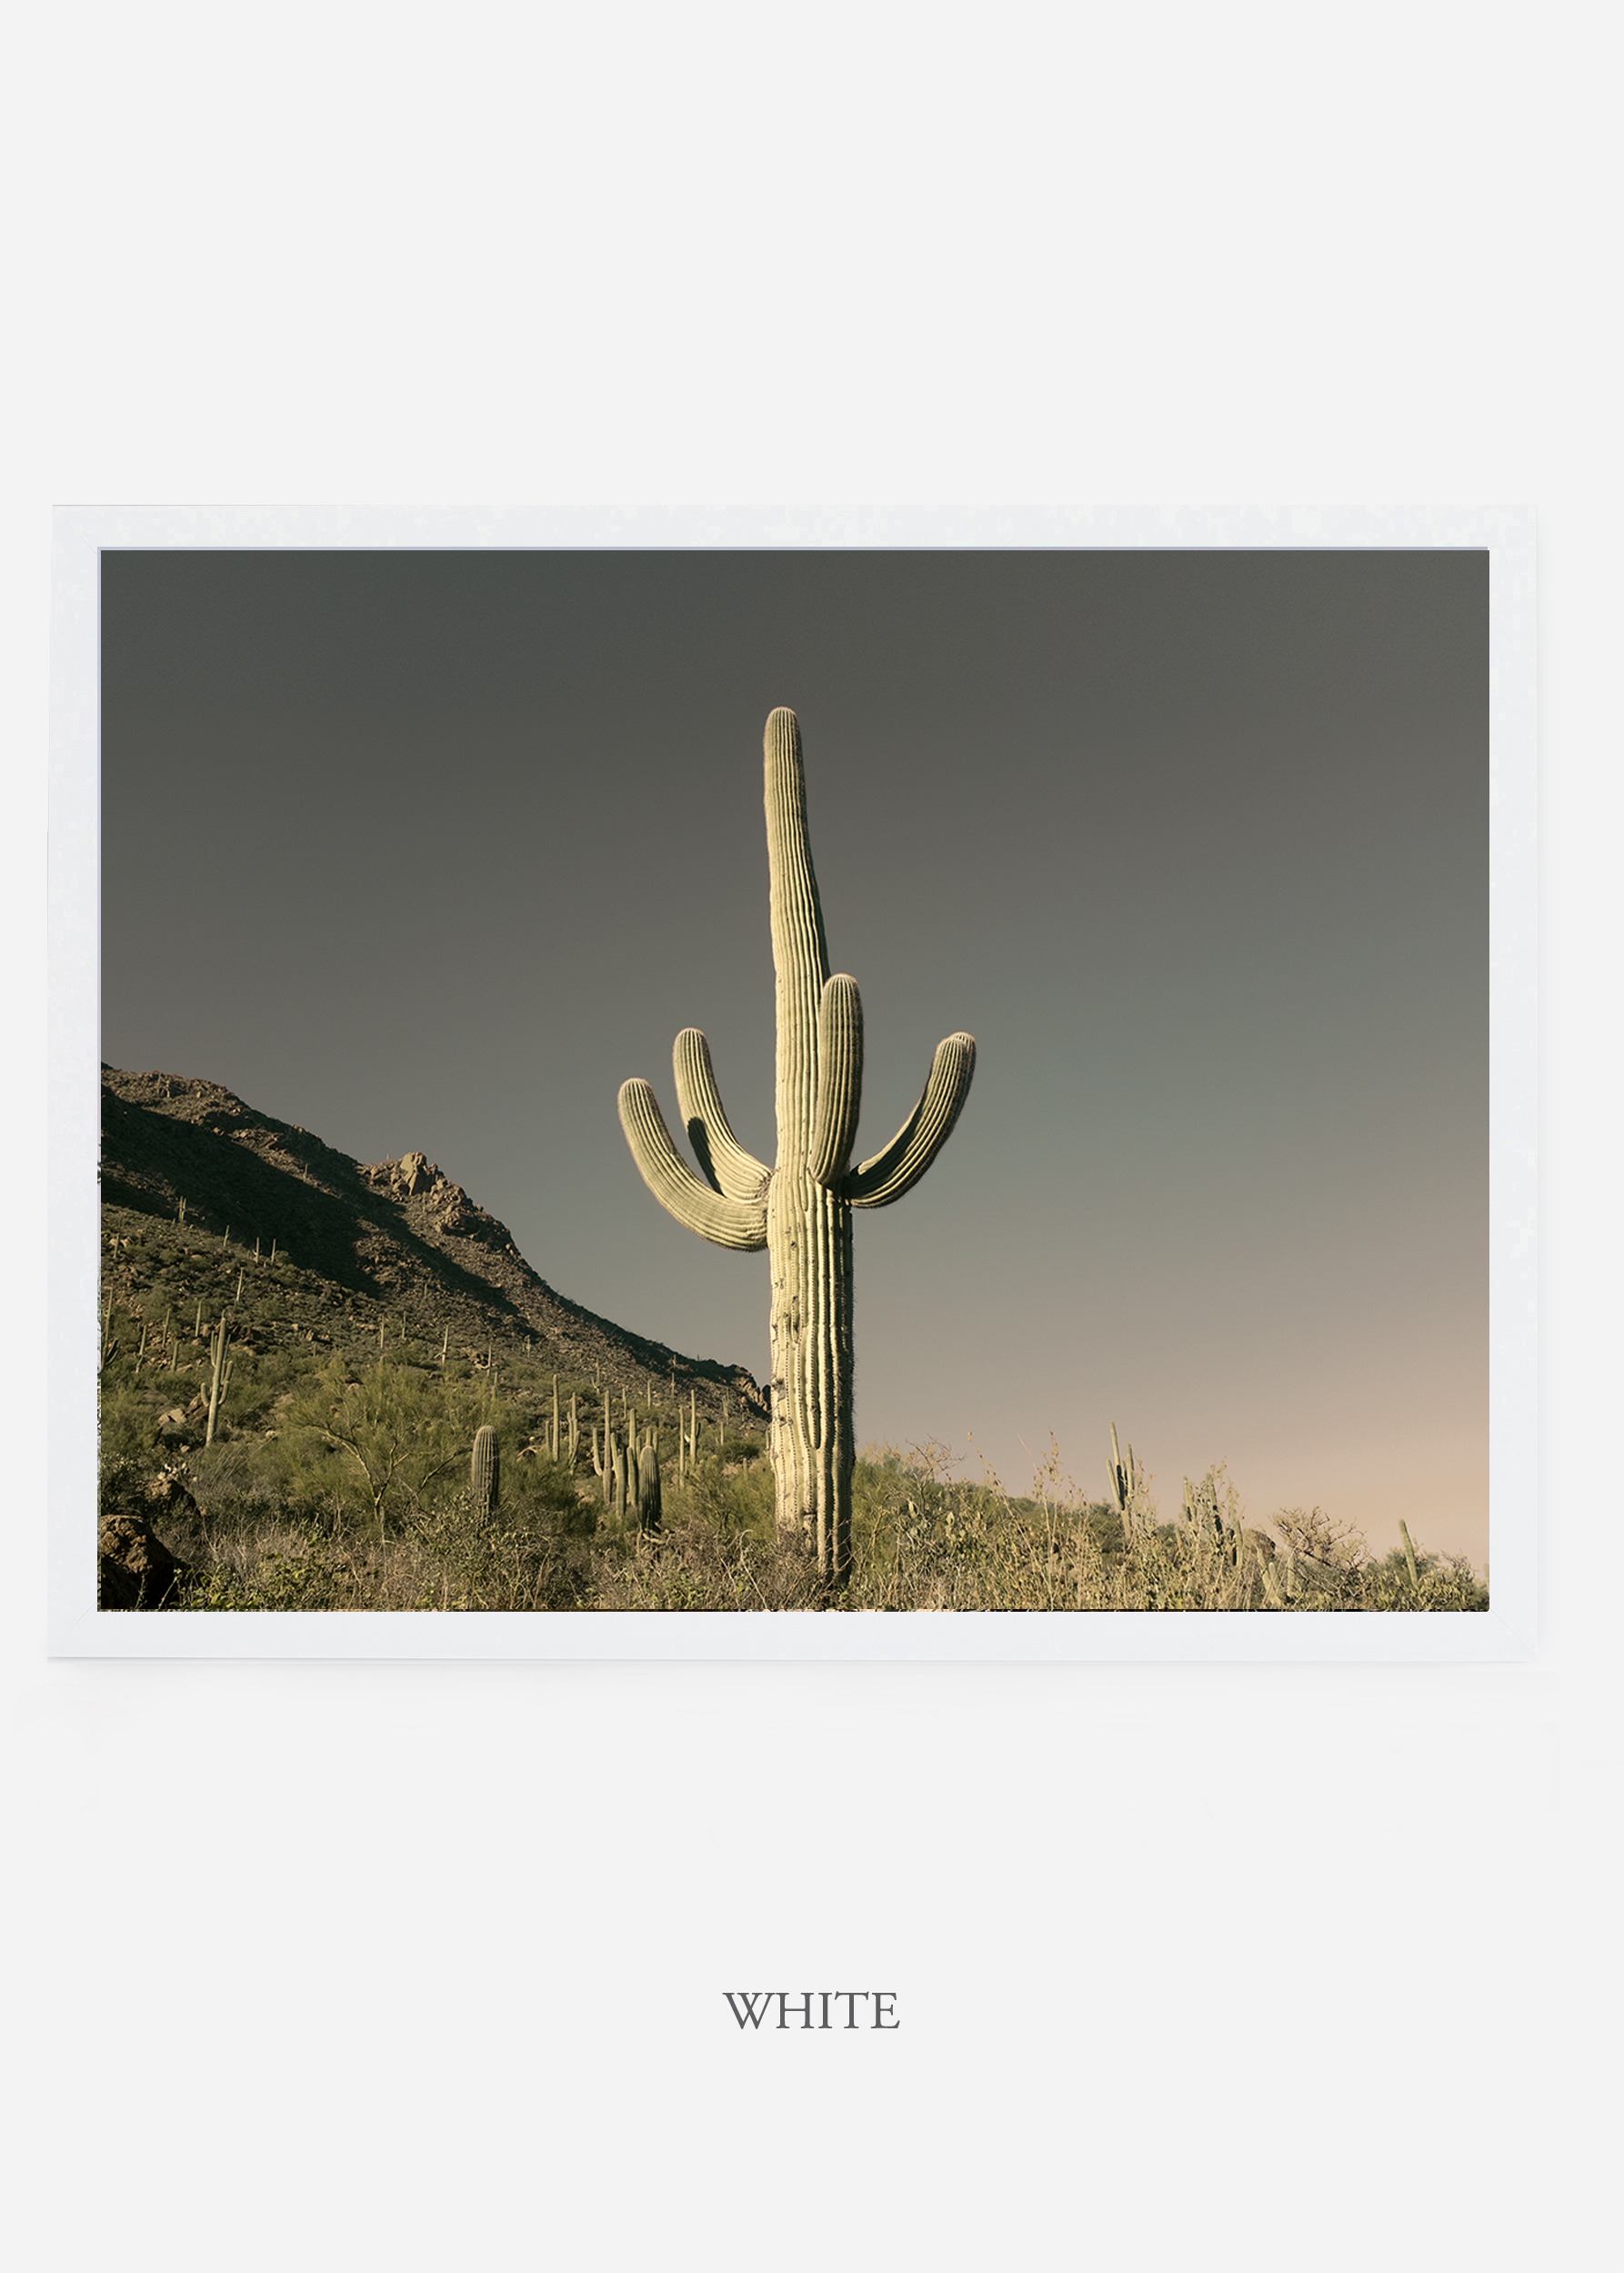 nomat_whiteframe-saguaroNo.19-wildercalifornia-art-wallart-cactusprint-homedecor-prints-arizona-botanical-artwork-interiordesign.jpg